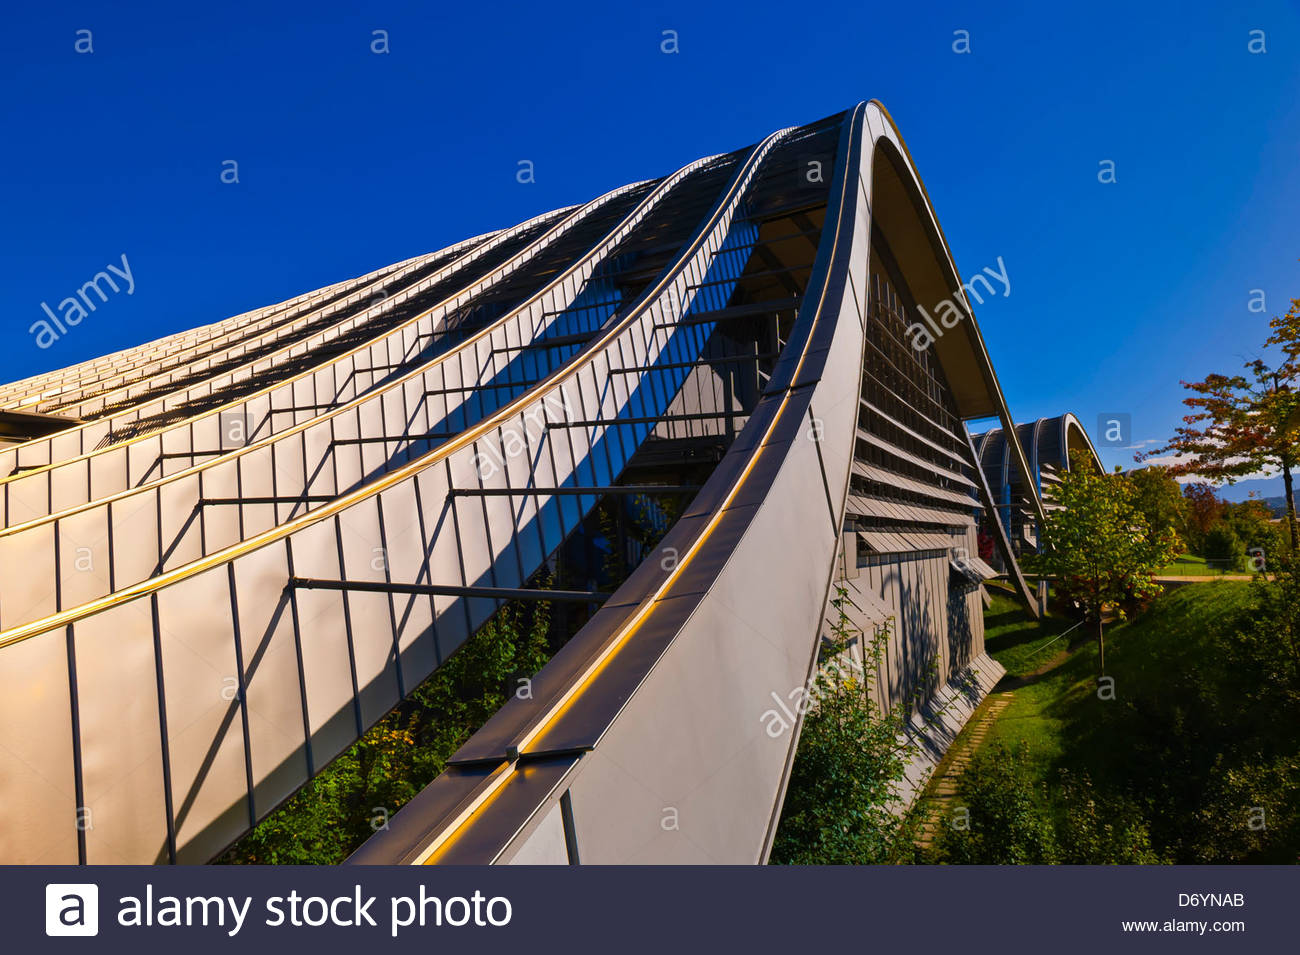 Exterior of the Zentrum Paul Klee (art gallery) by Italian architect Renzo Piano, Bern, Canton Bern, Switzerland Stock Photo